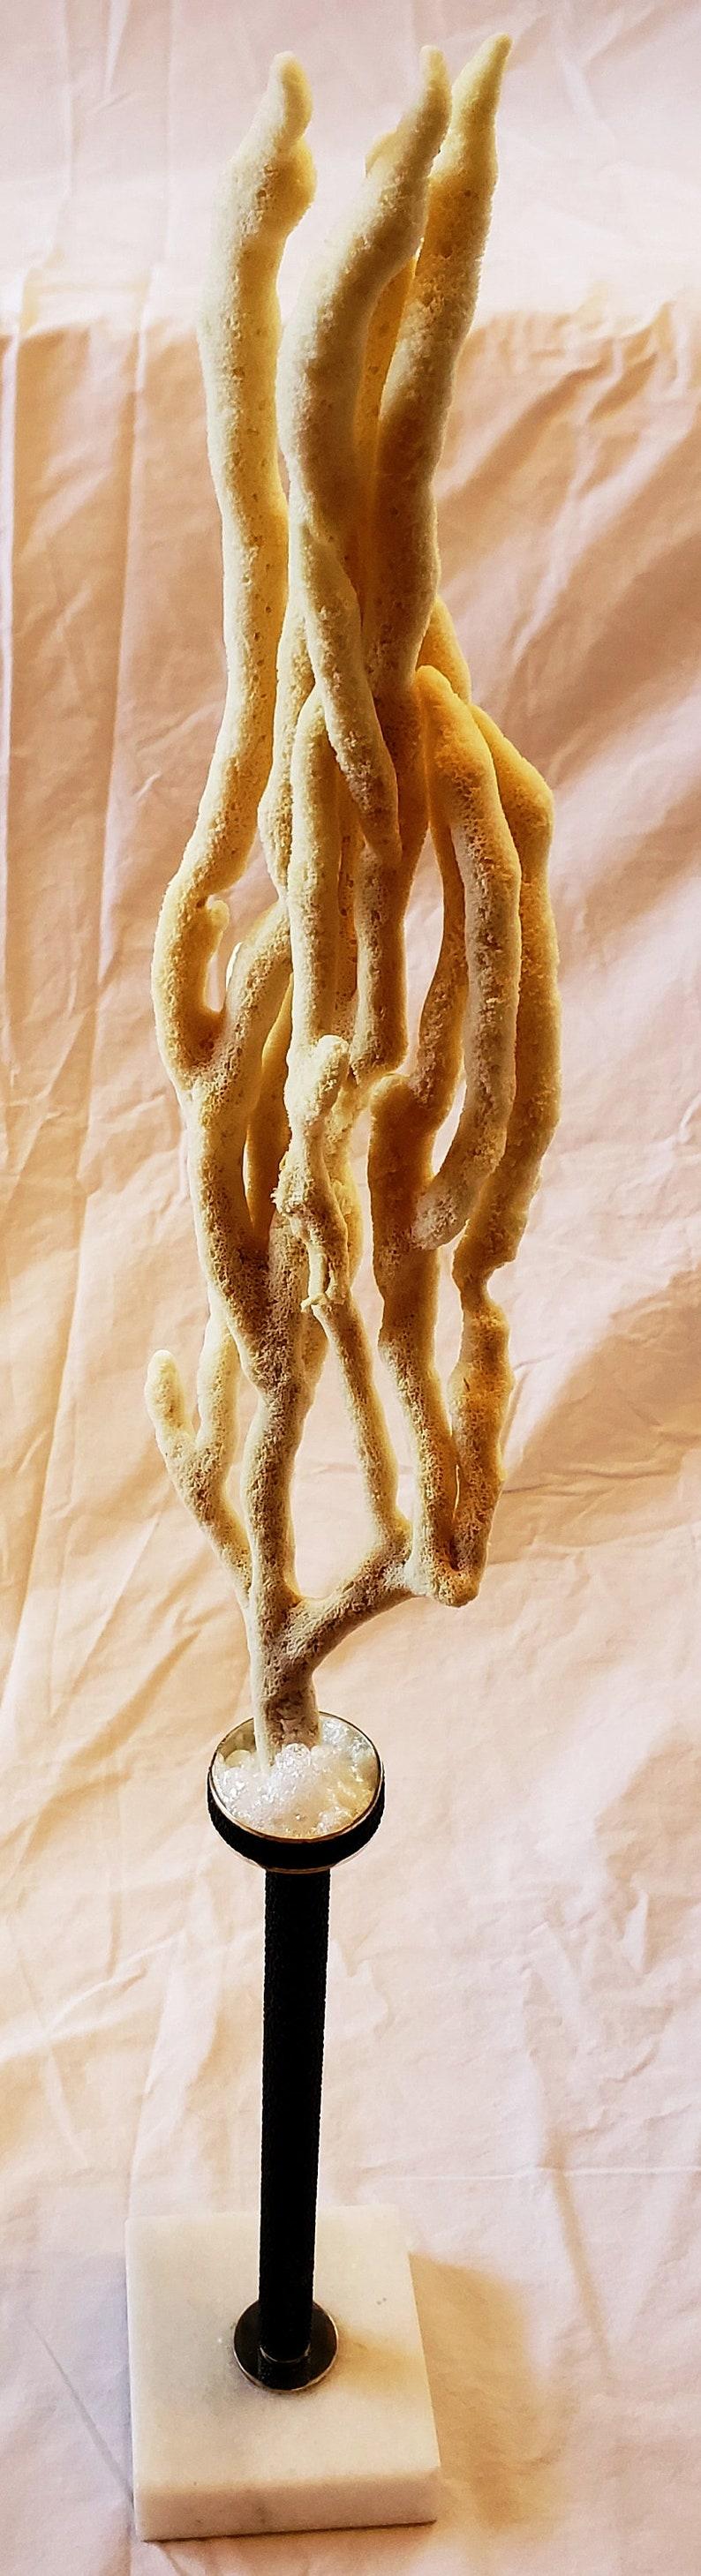 Finger Sponge mounted n Sea Foam atop a pedestal wrapped in Black Sea Cucumber Leather